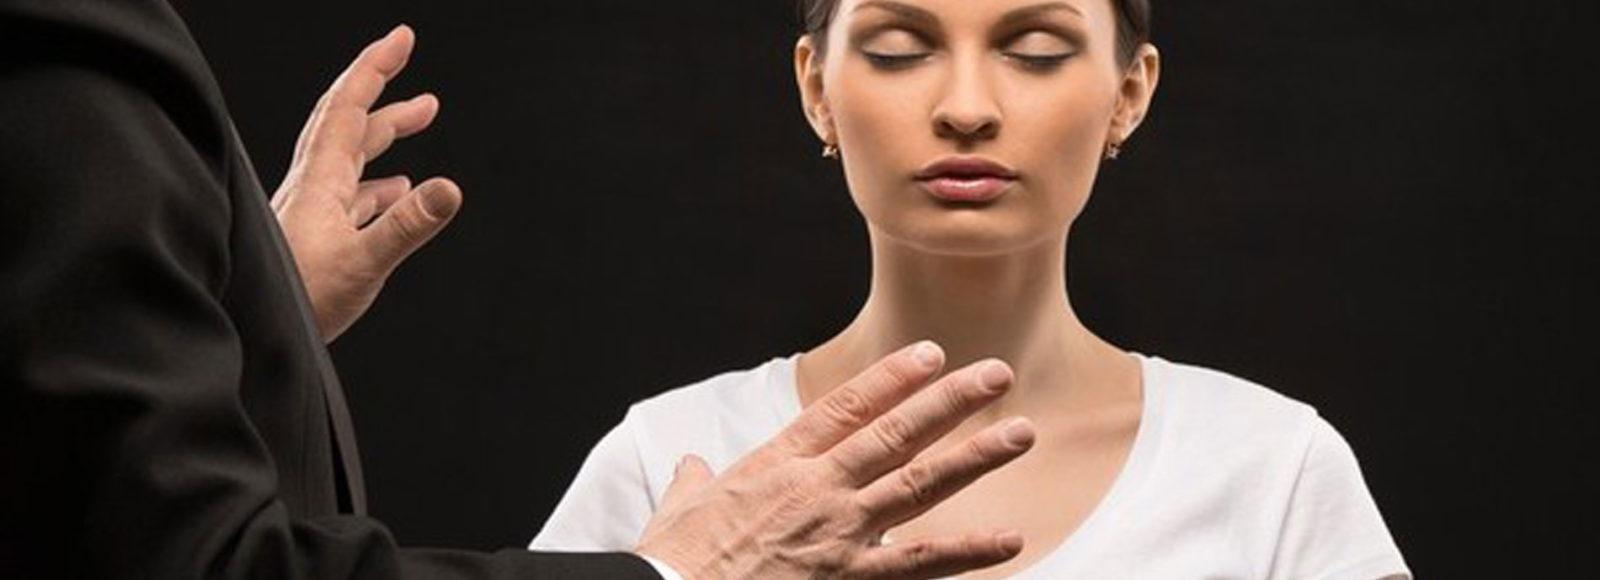 hipno akupuntur